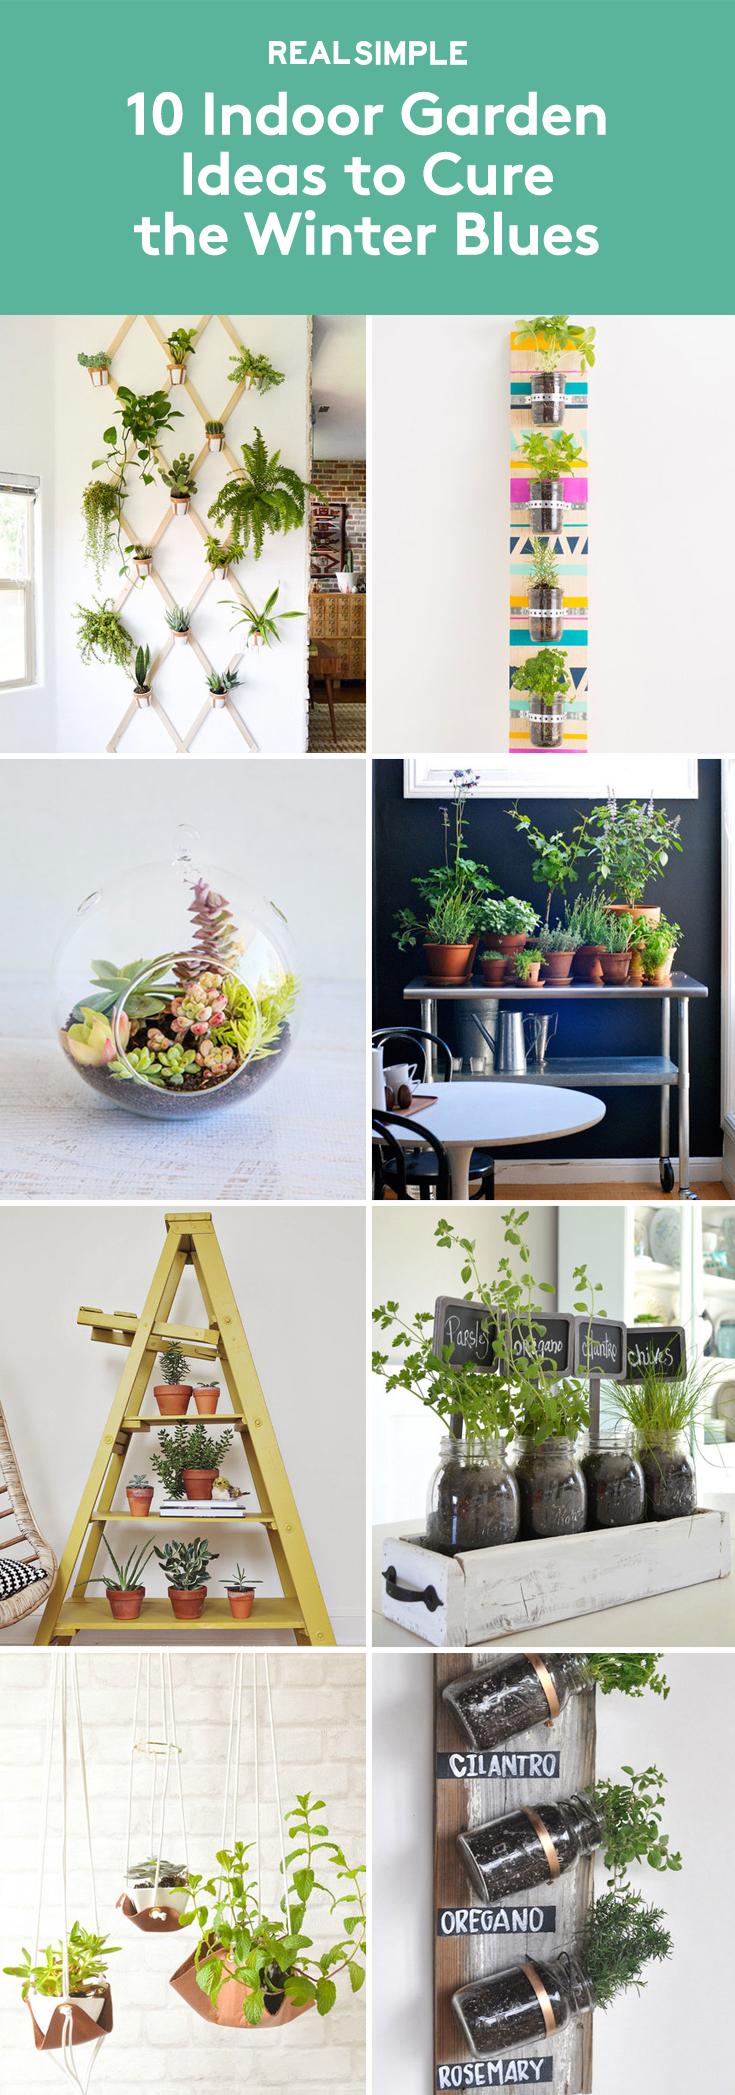 10 indoor garden ideas to cure the winter blues gardens garden